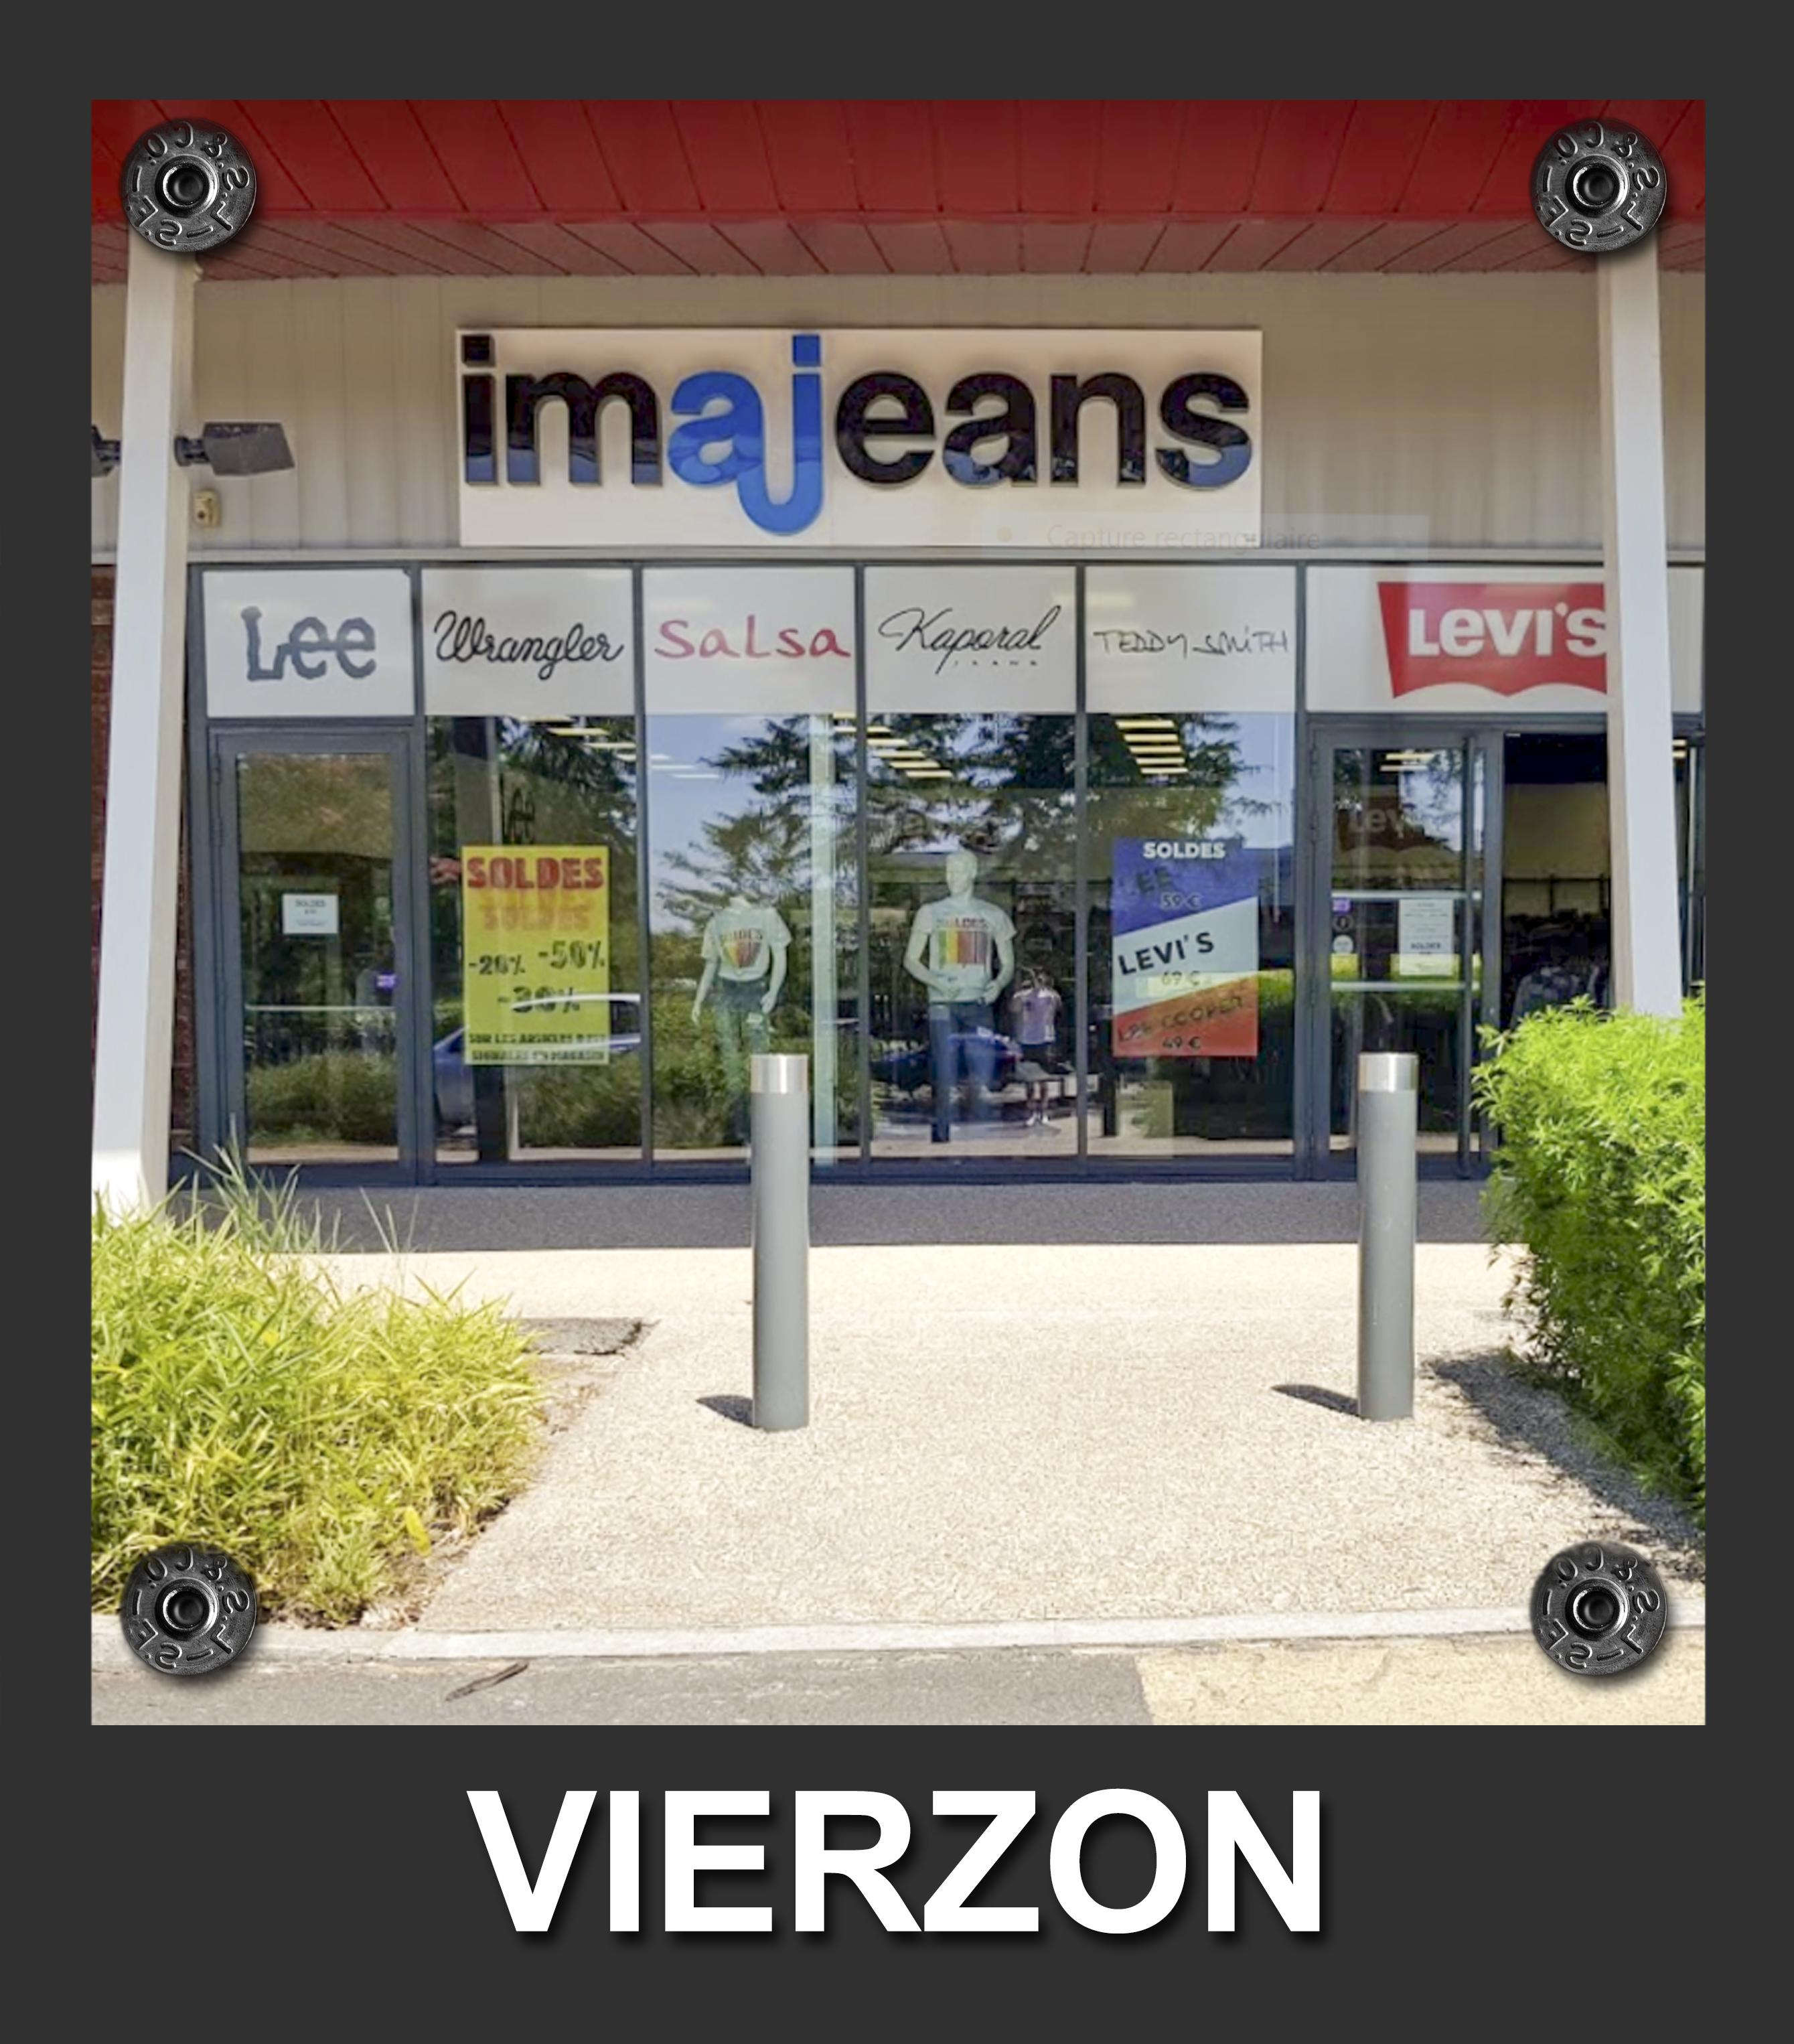 Imajeans Vierzon